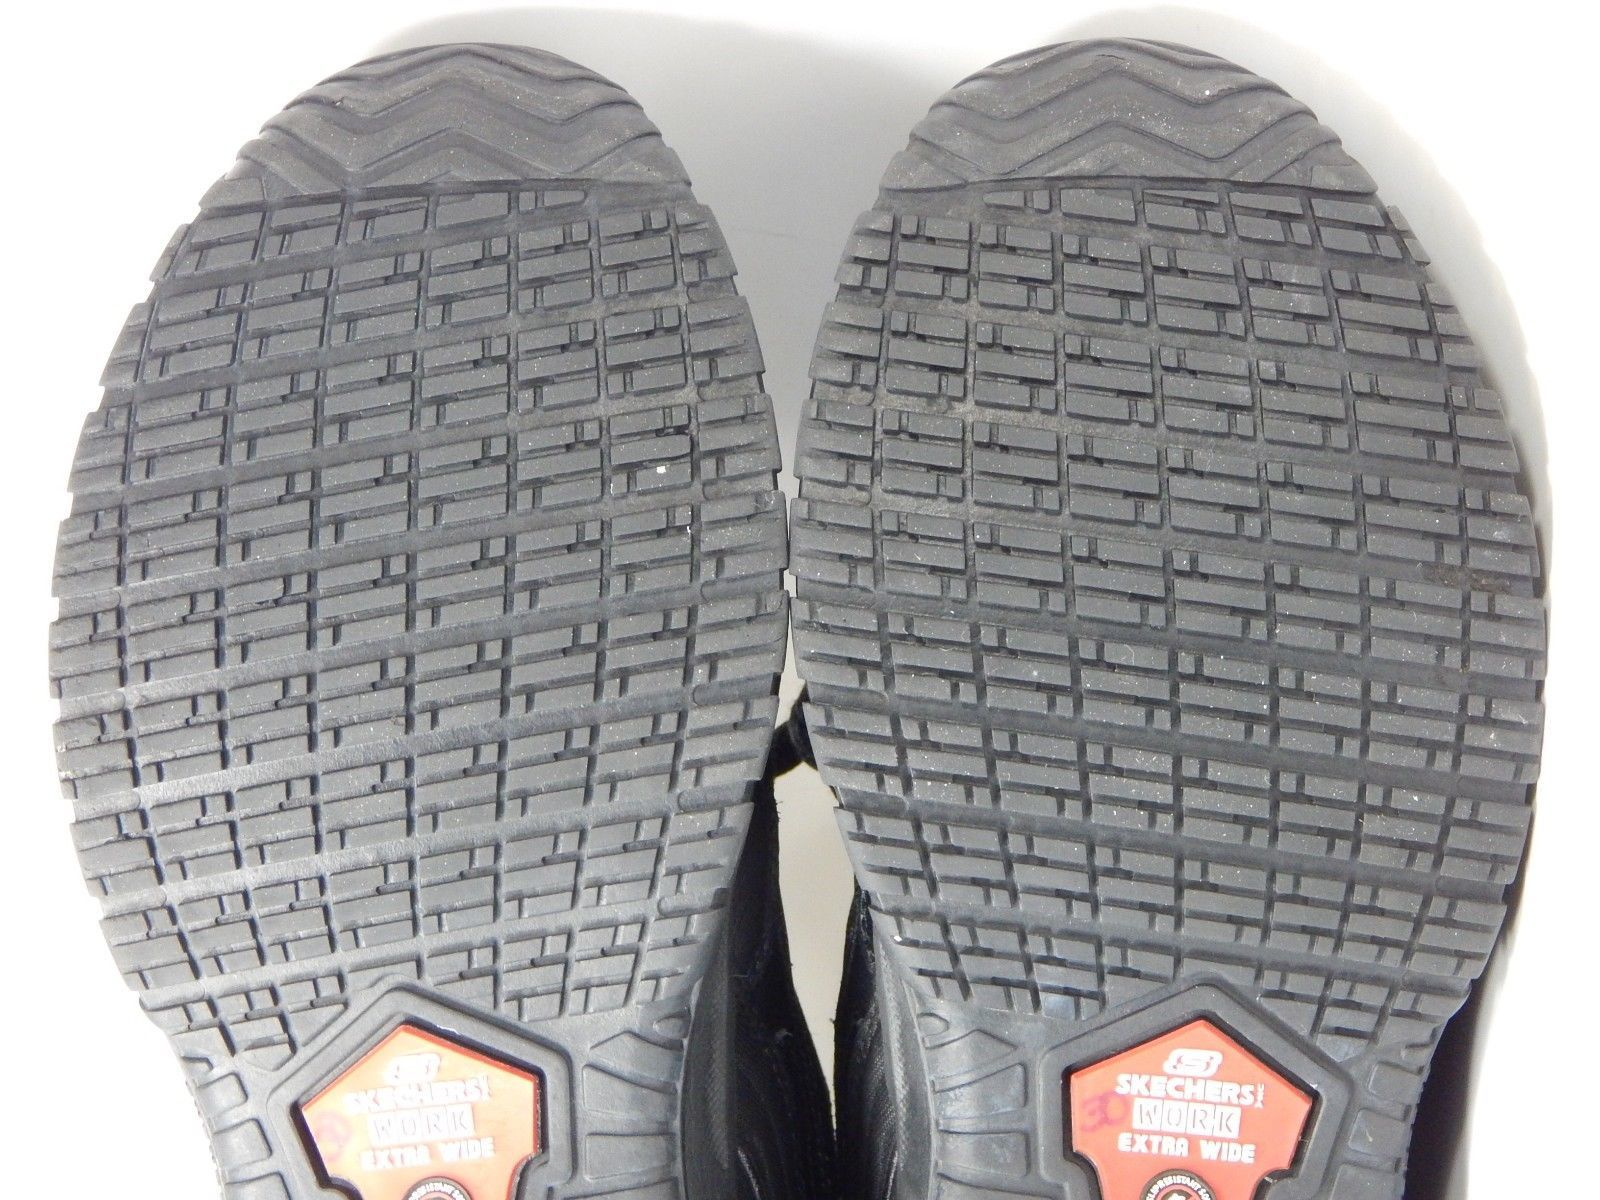 Skechers Soft Stride Mavin Size 8.5 4E (EW) EXTRA WIDE EU: 41.5 Men's Work Shoes